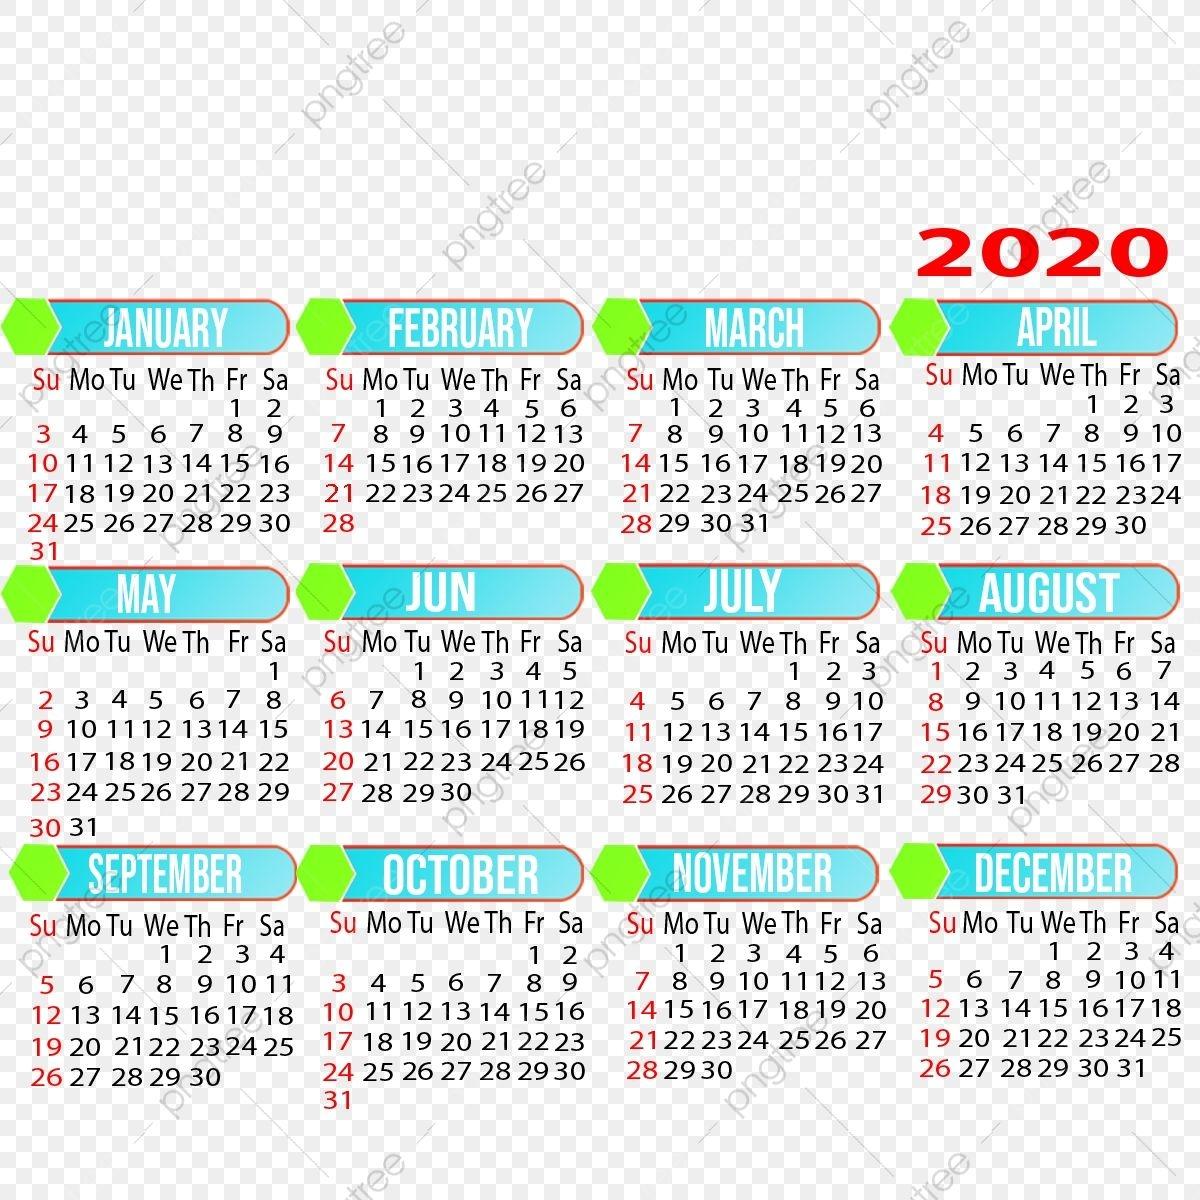 2021 Yearly Calendar Design, 2021, Calendar, 2021 Calendar